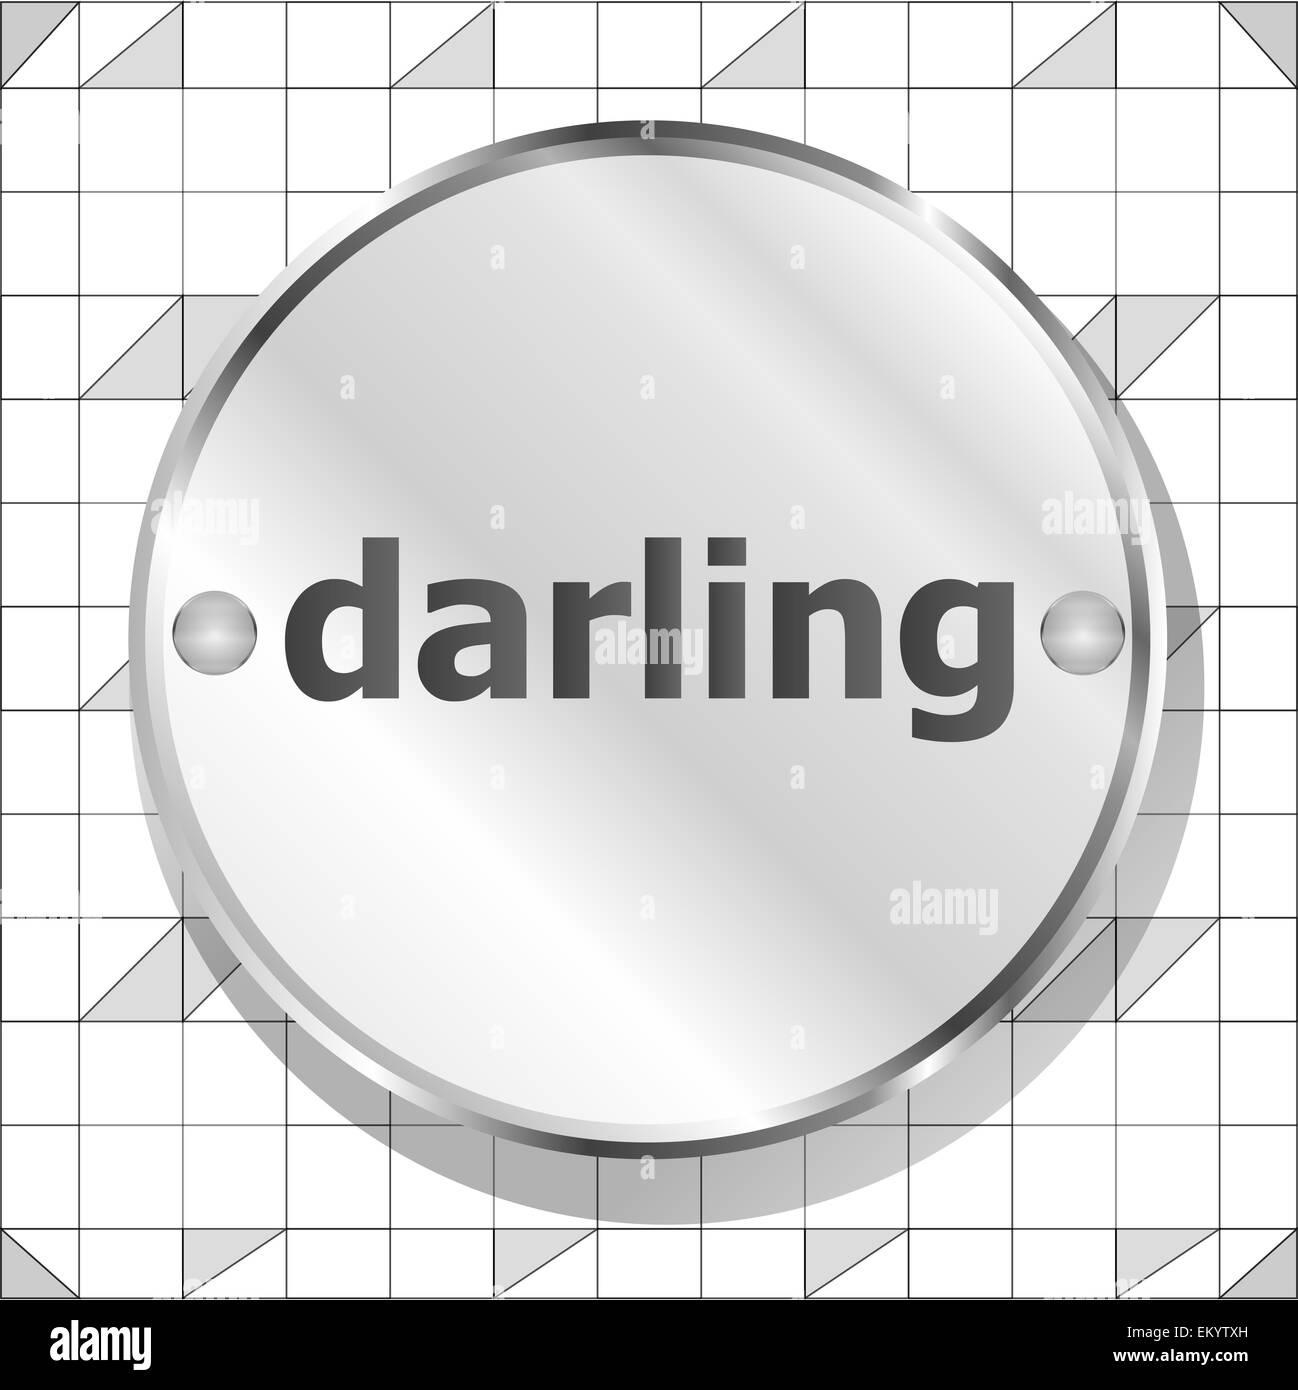 word darling on metallic button - Stock Image